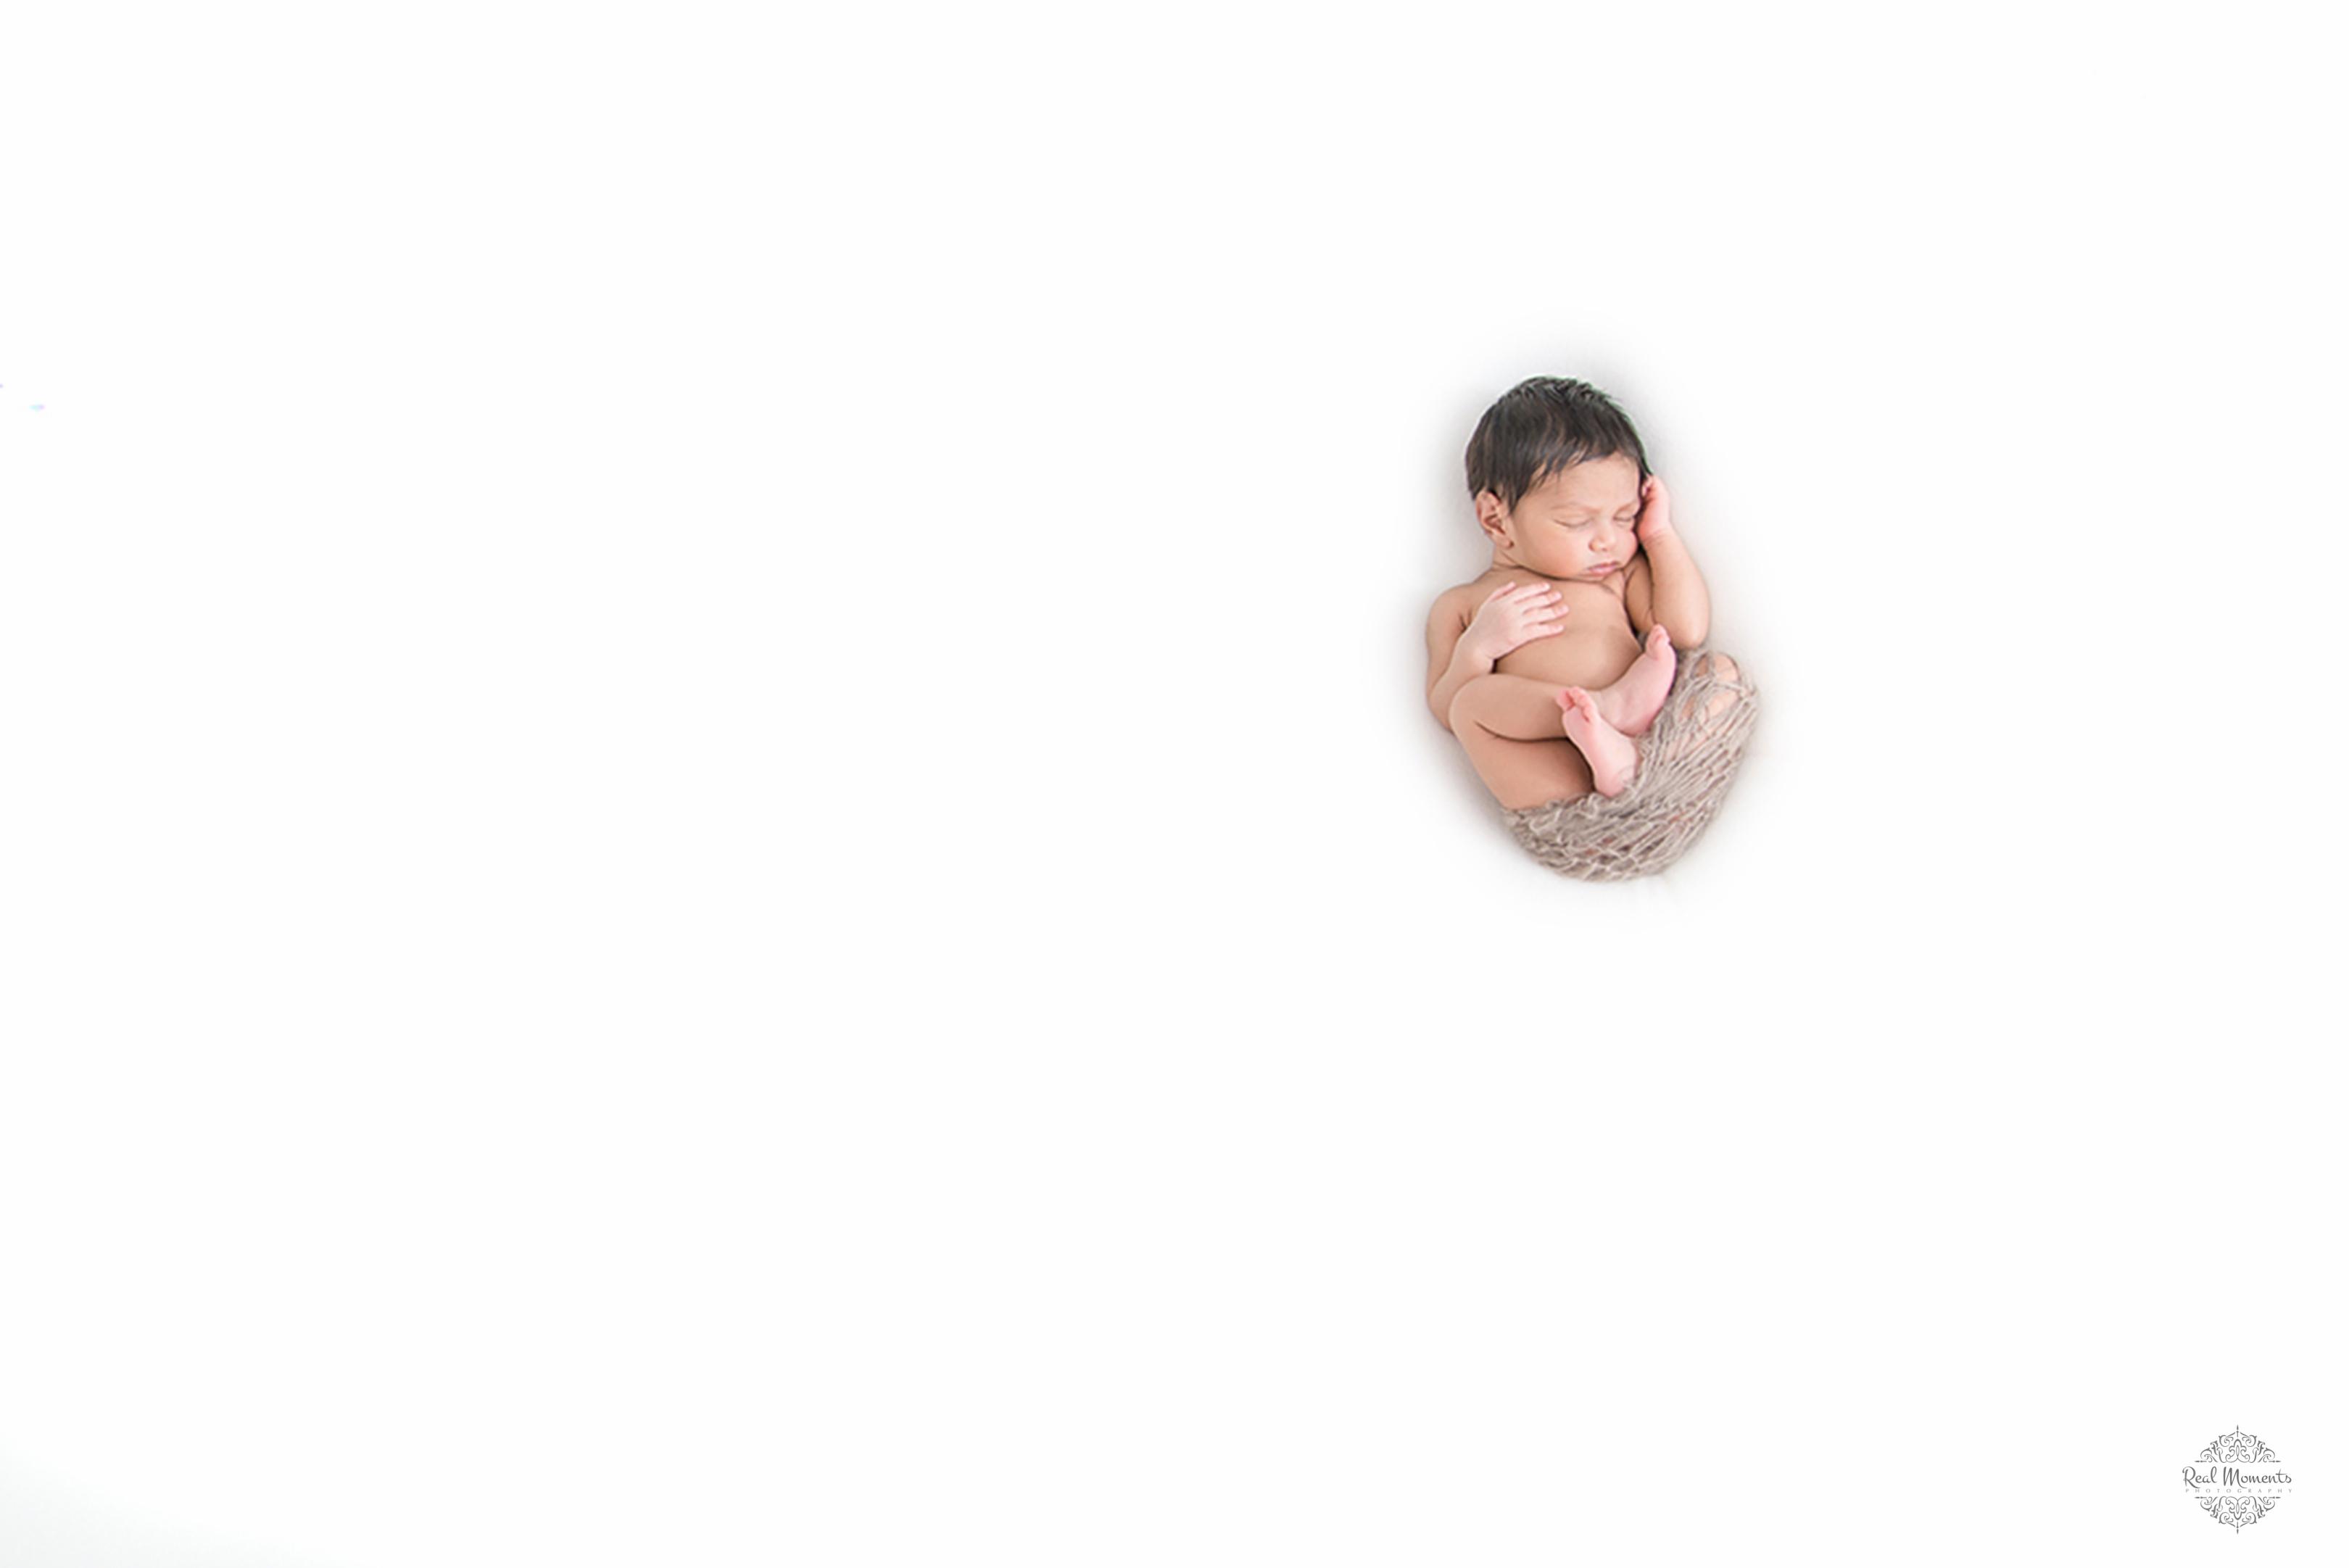 childrenphotography - Newborn portrait of Baby Achu